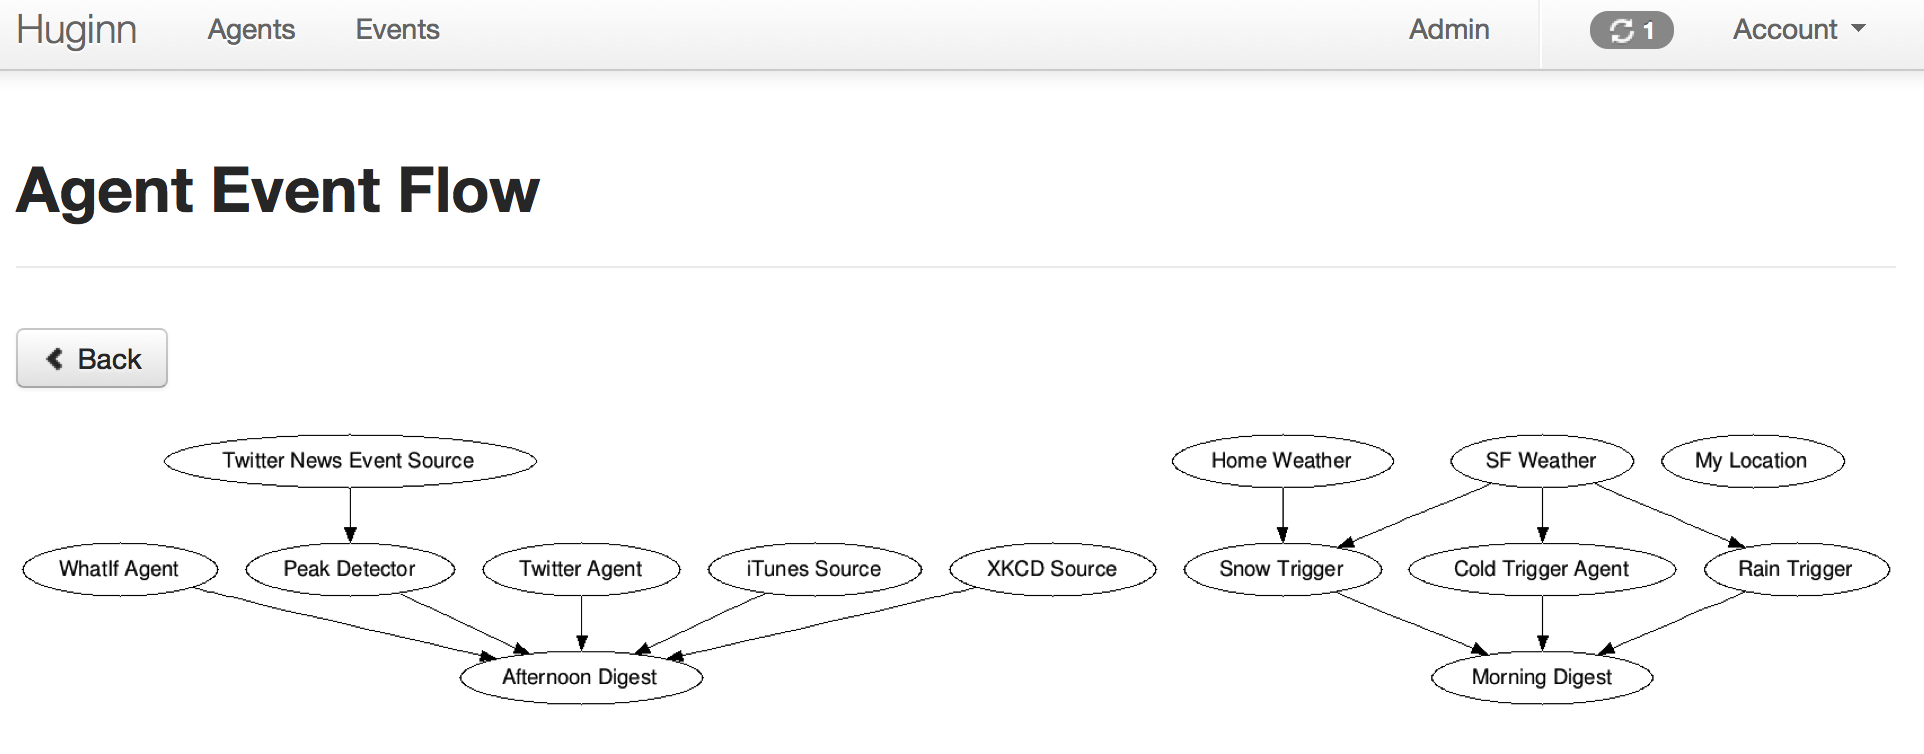 Event flow diagram